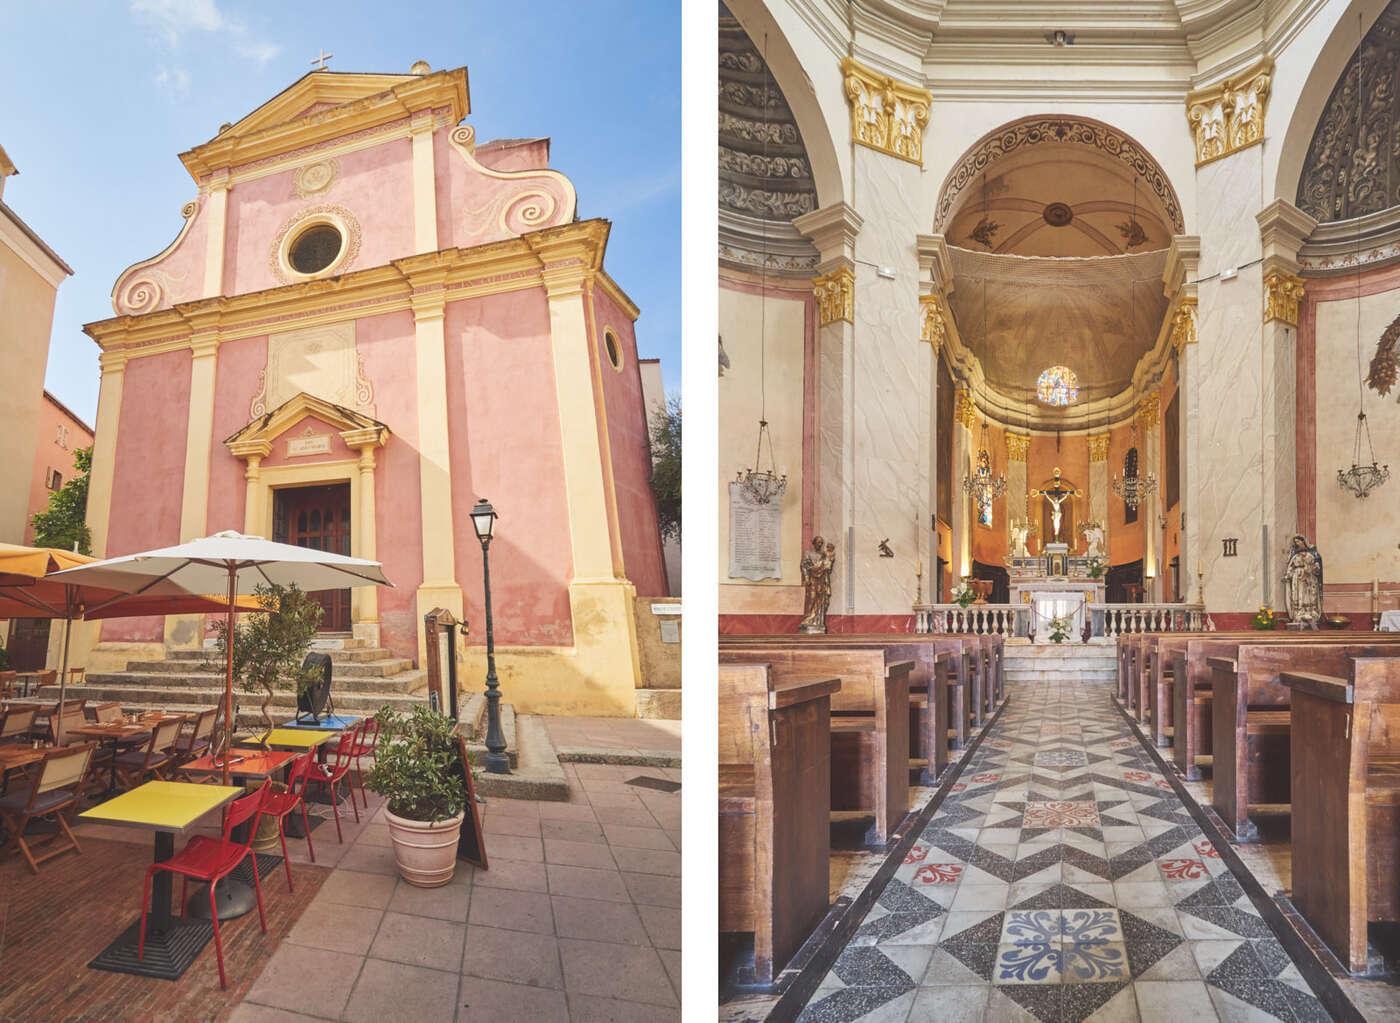 Église sainte Marie majeure de Calvi